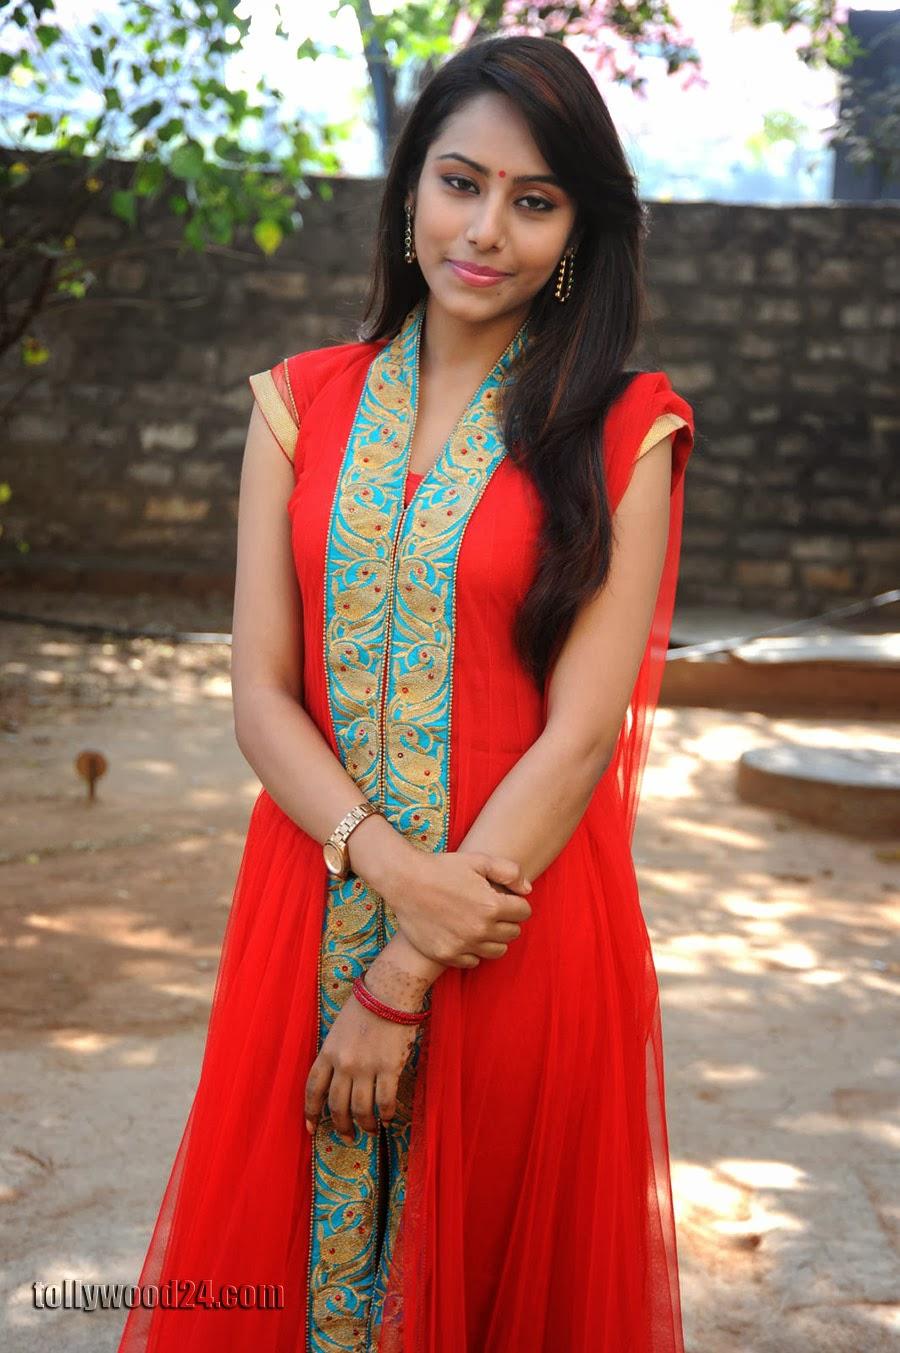 Beautiful Khenisha Chandran Photos Gallery-HQ-Photo-14